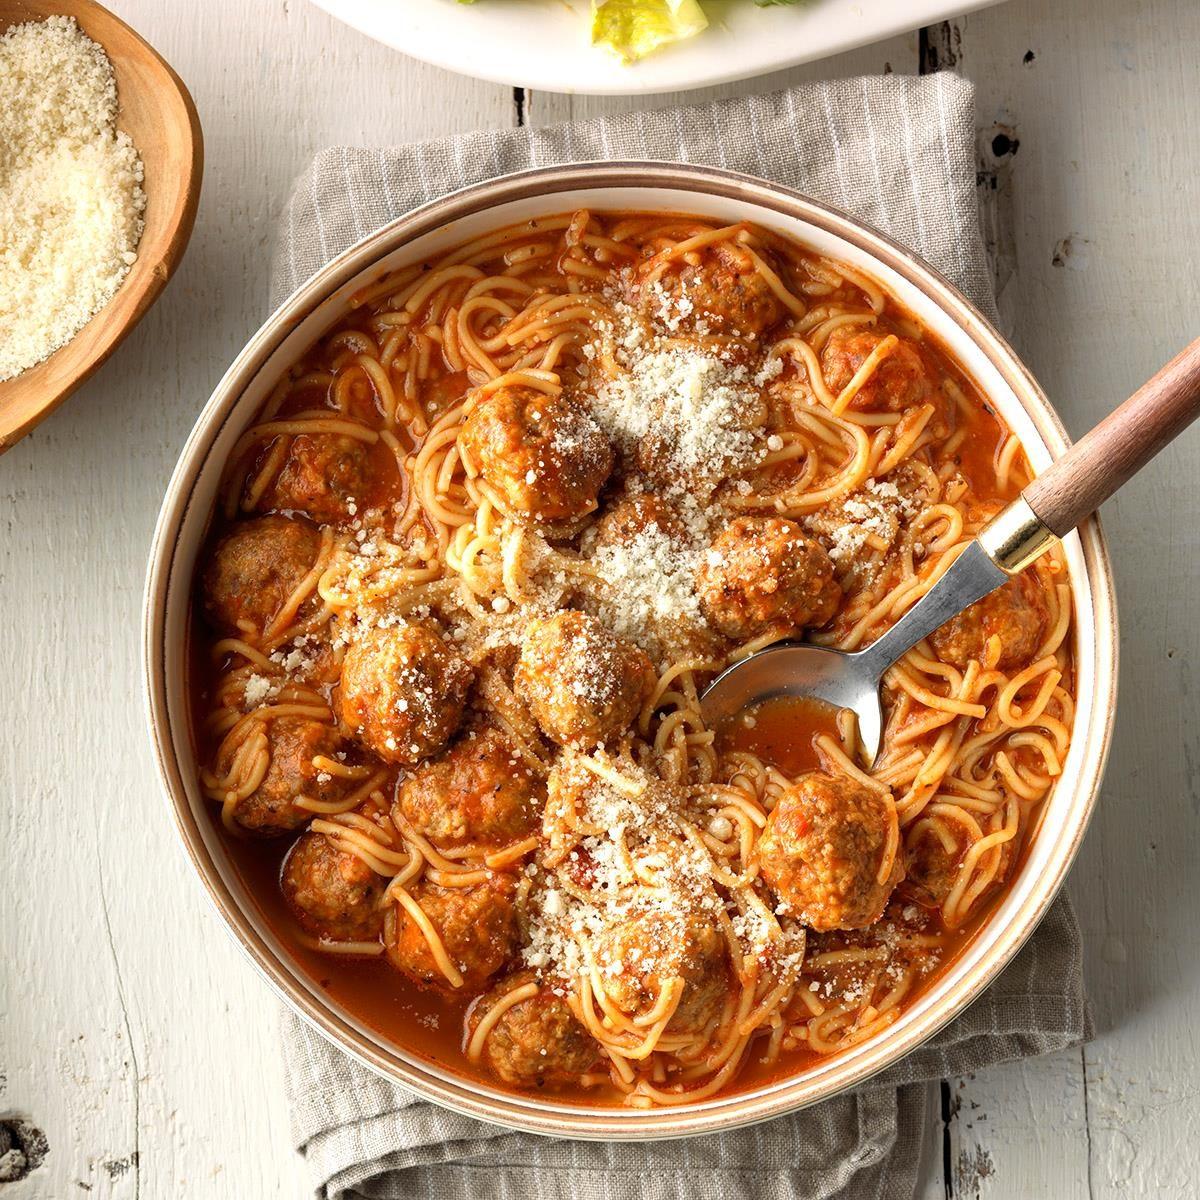 Spaghetti Amp Meatball Soup Recipe Taste Of Home